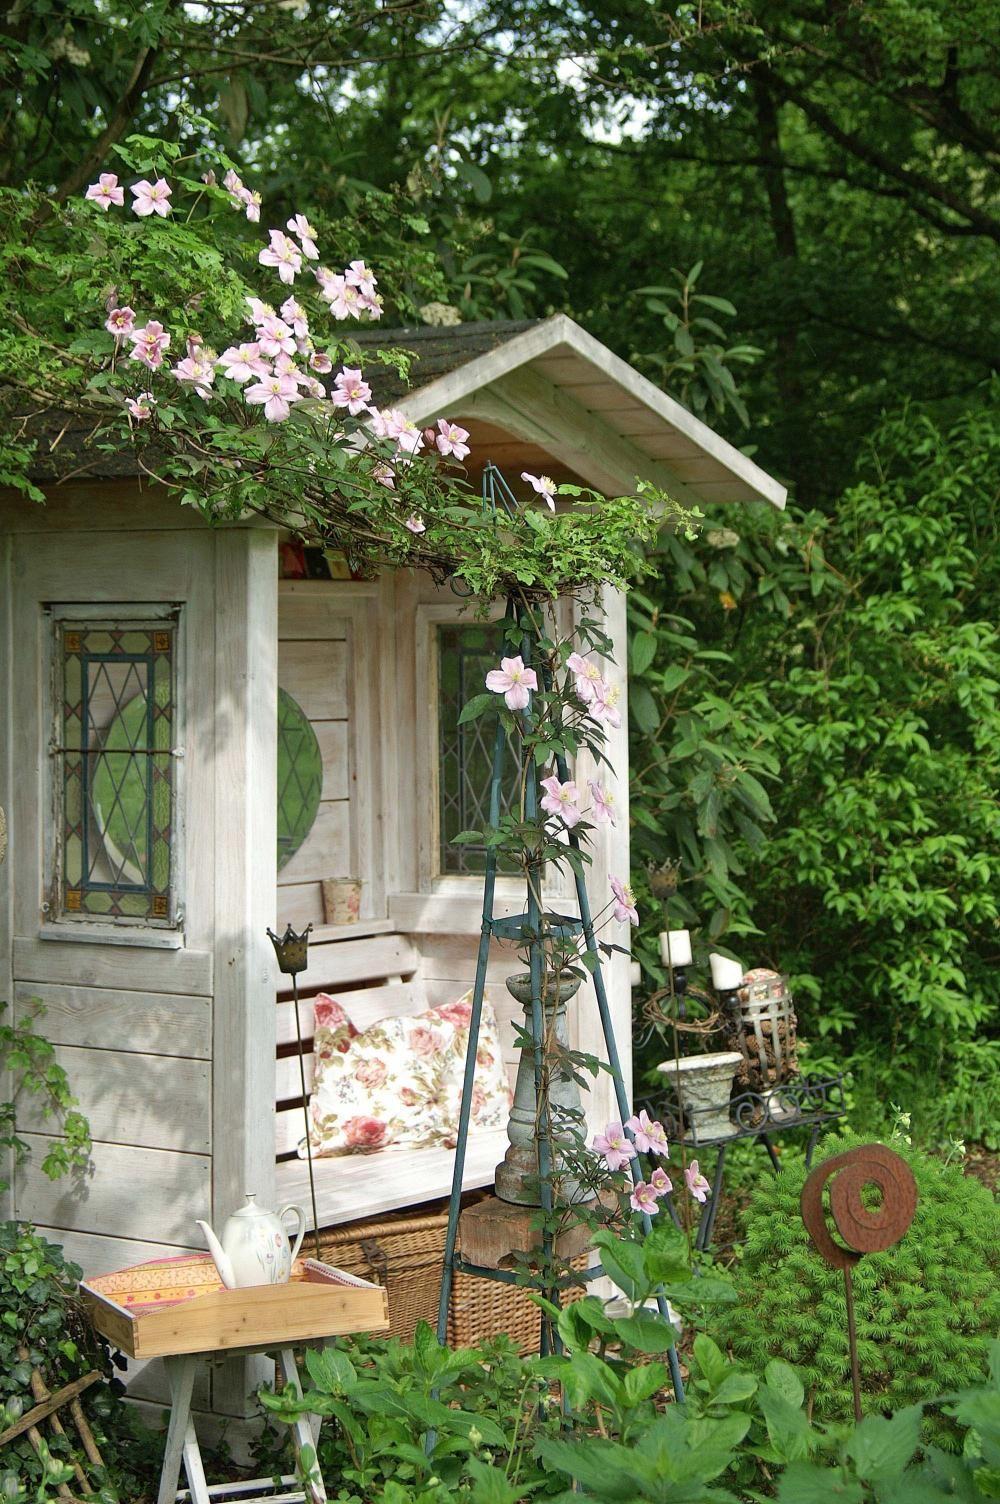 12 Ideen Fur Sitzplatze Im Garten Garten Gartenecke Sitzplatz Im Garten